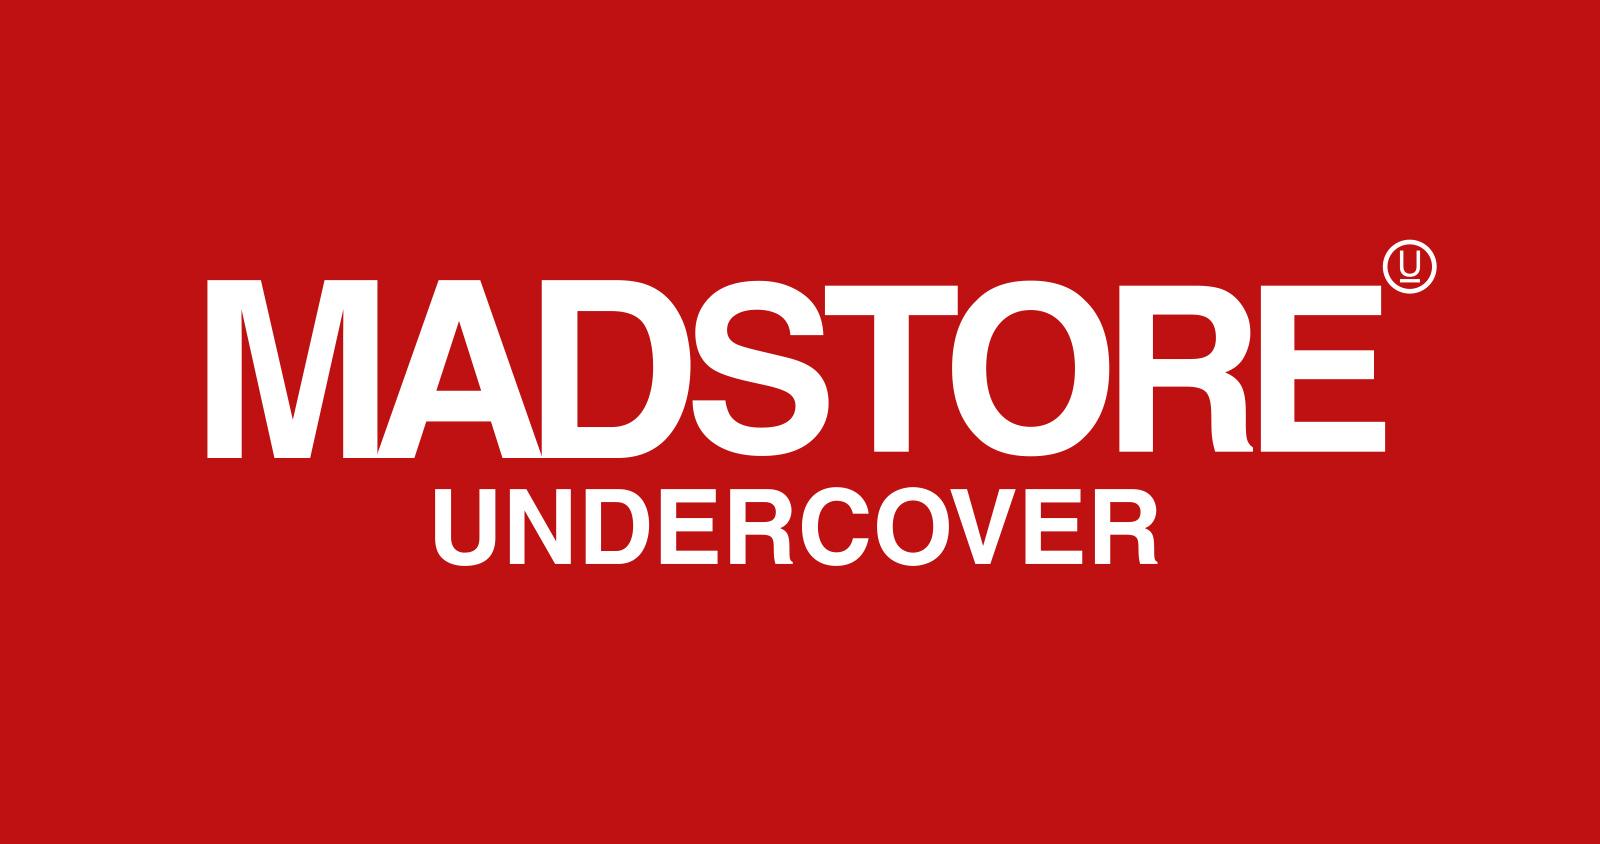 1806dsmny_undercover.jpg